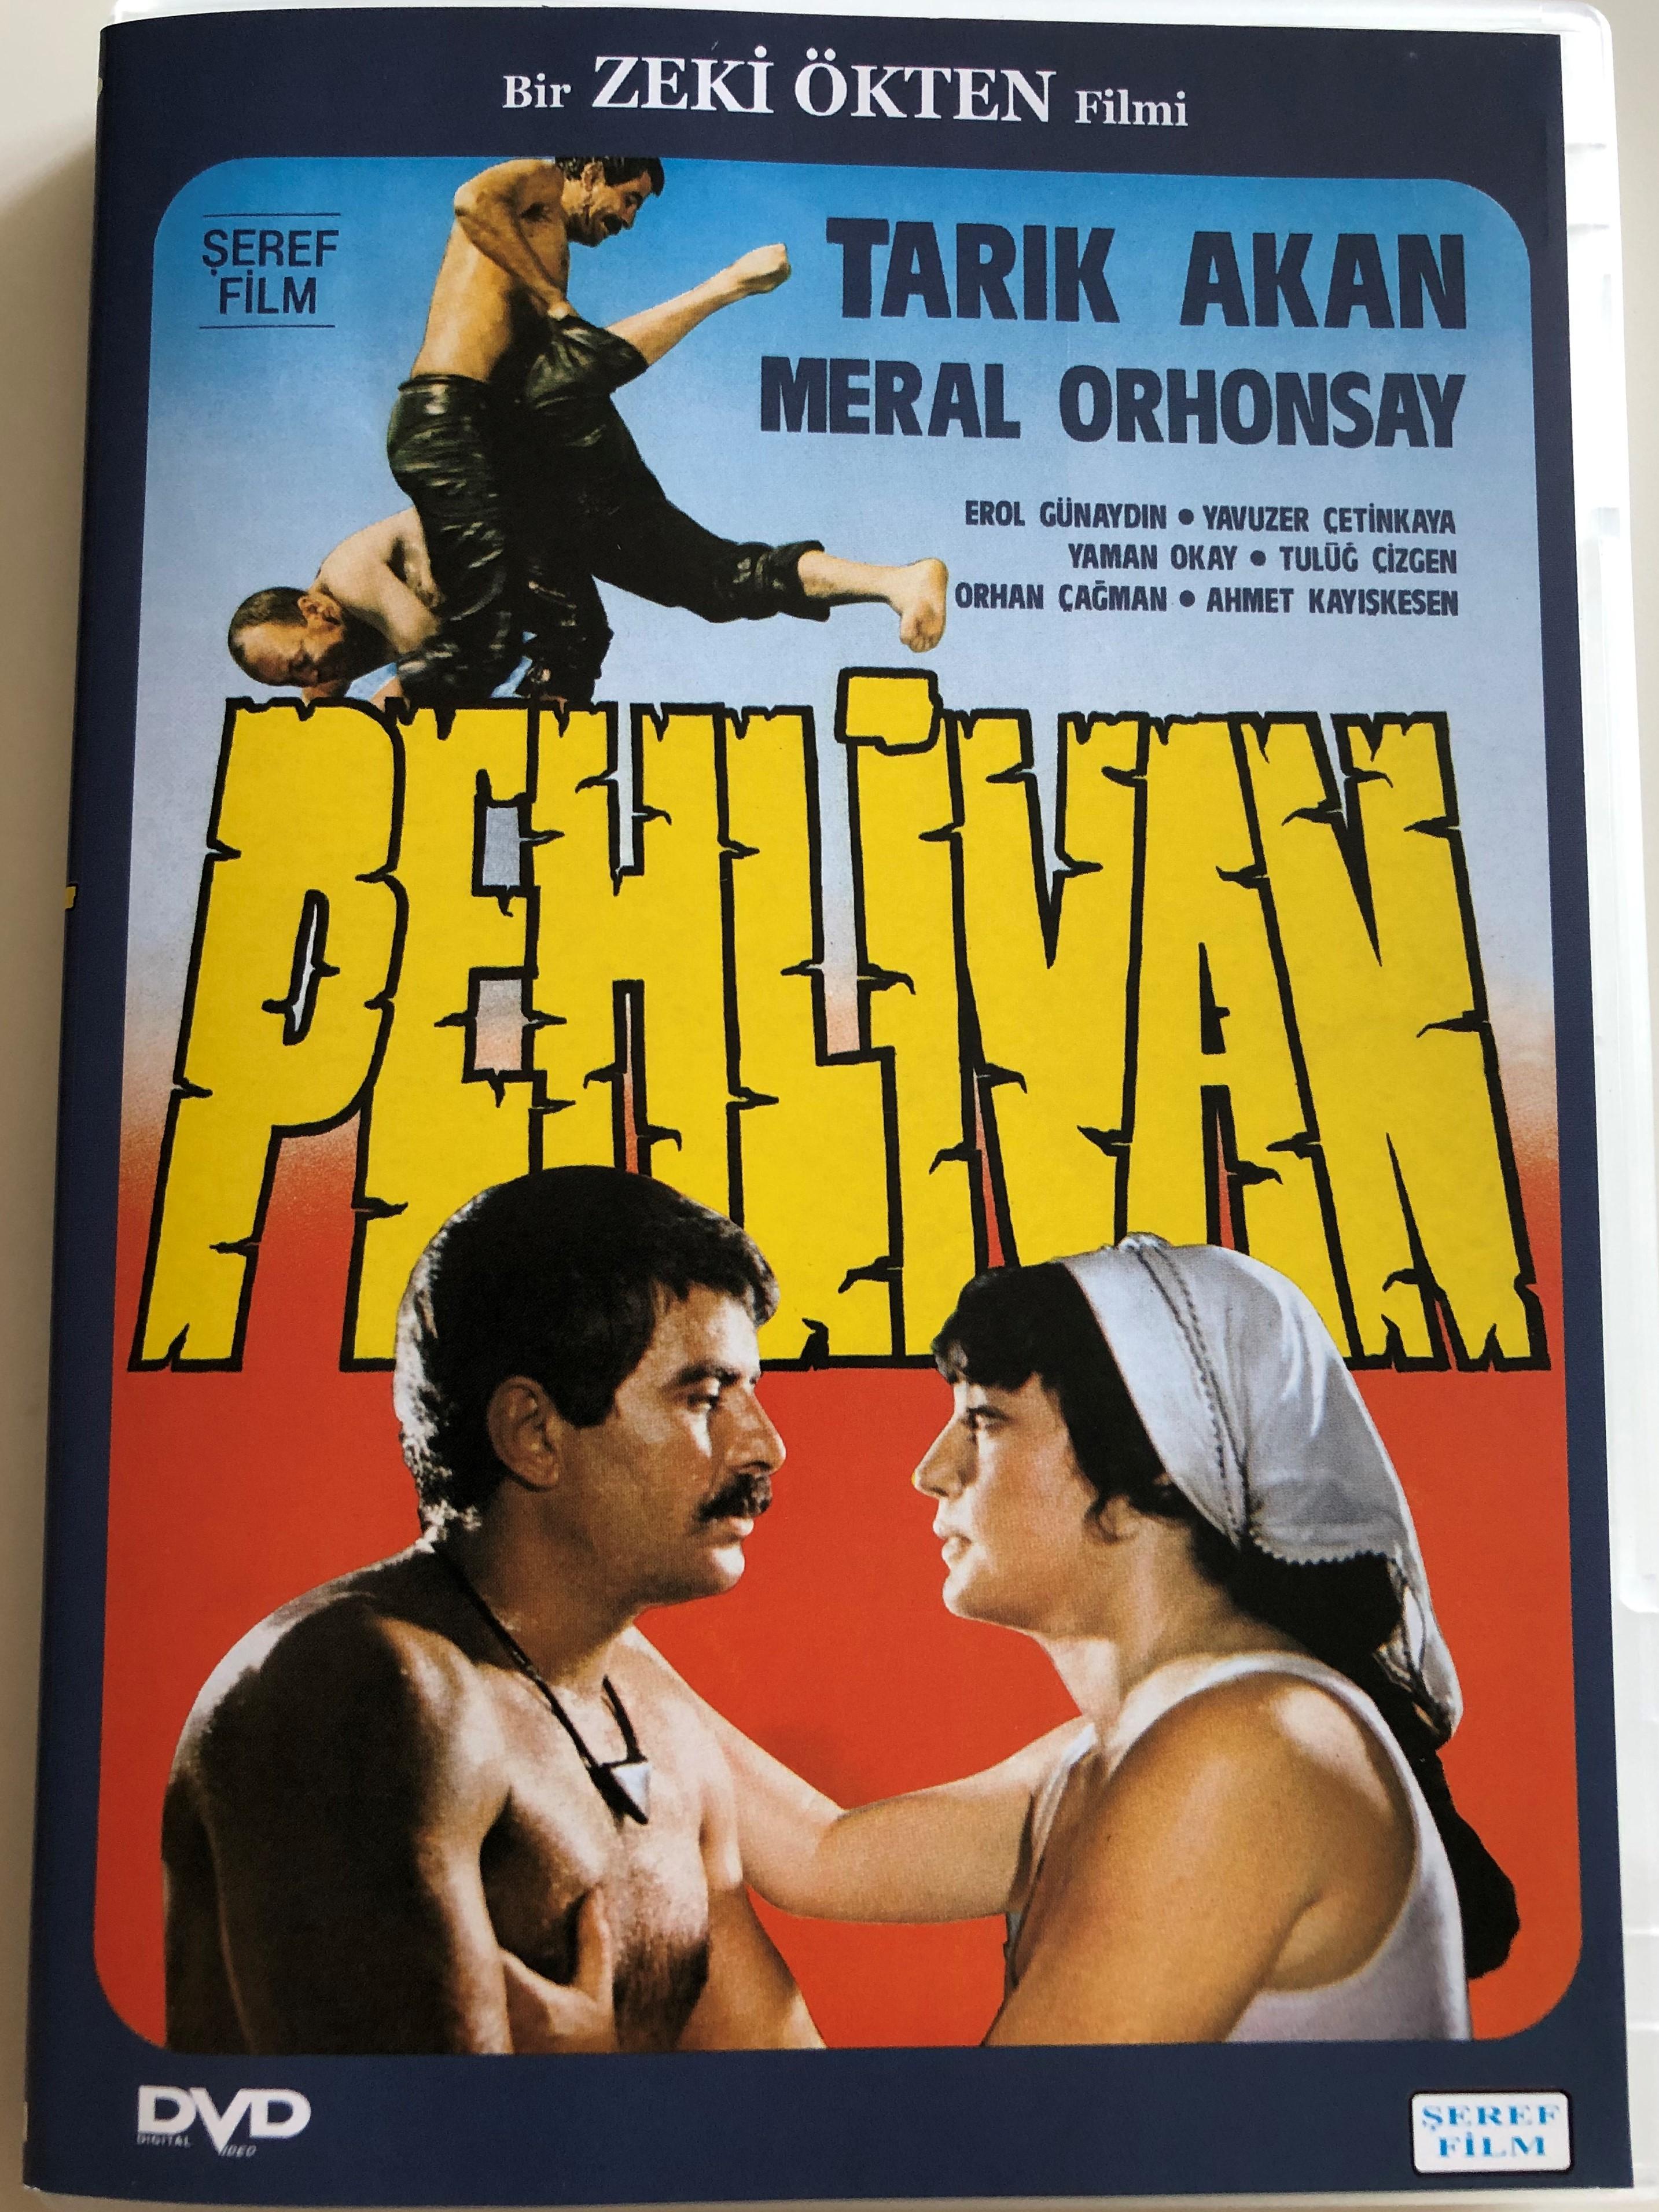 pehlivan-dvd-1984-directed-by-zeki-kten-starring-tar-k-akan-meral-orhonsay-erol-g-naydin-yavuzer-cetinkaya-1-.jpg